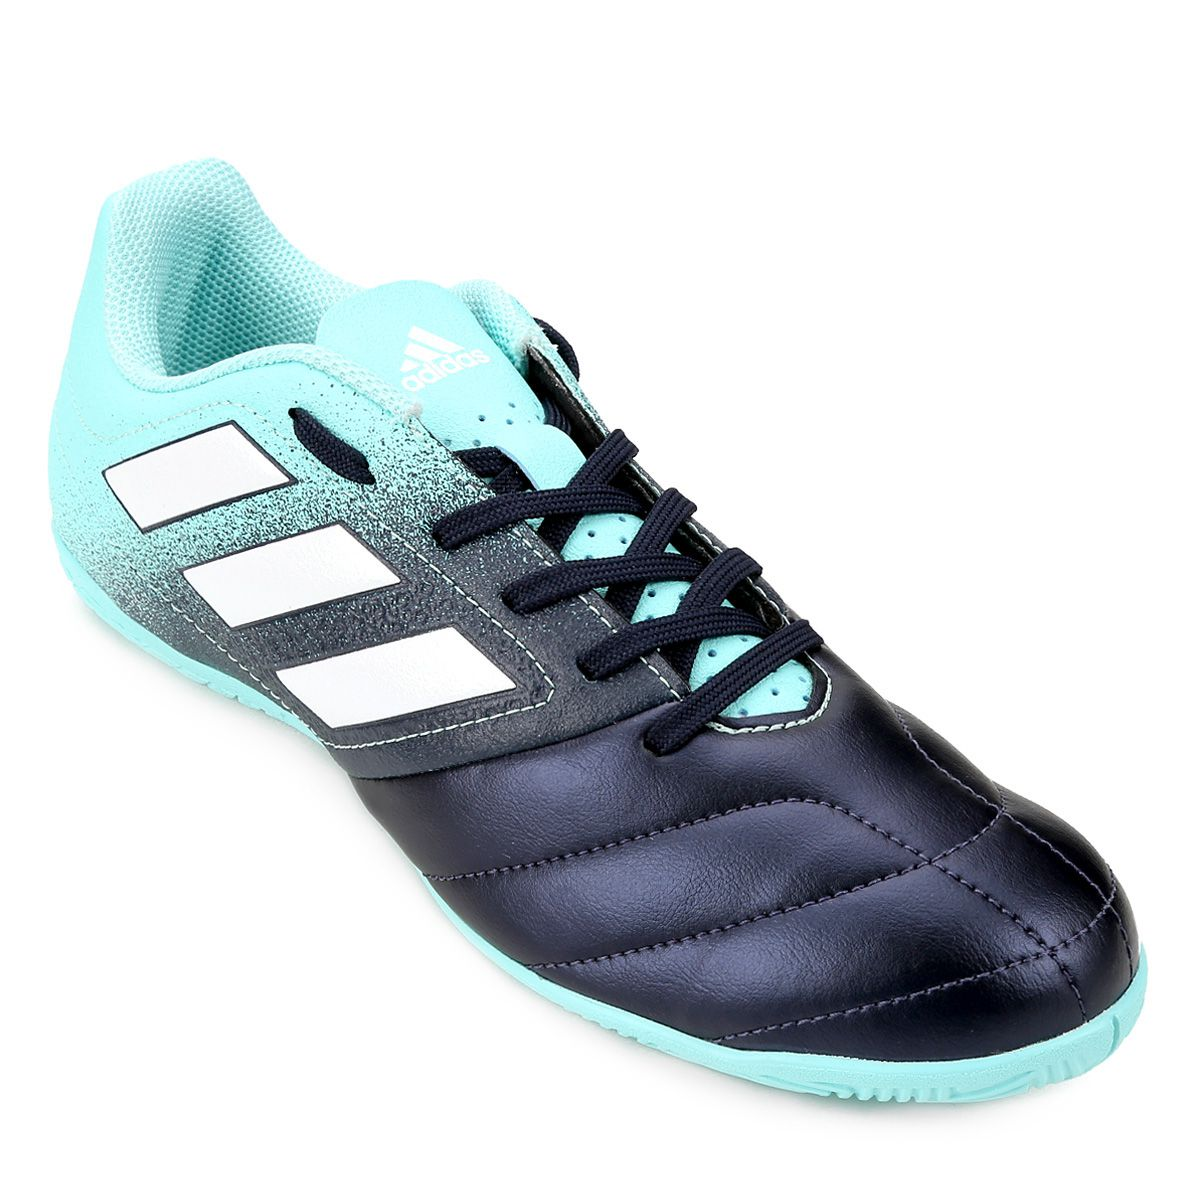 Chuteira Campo Adidas Ace 17.4 IN